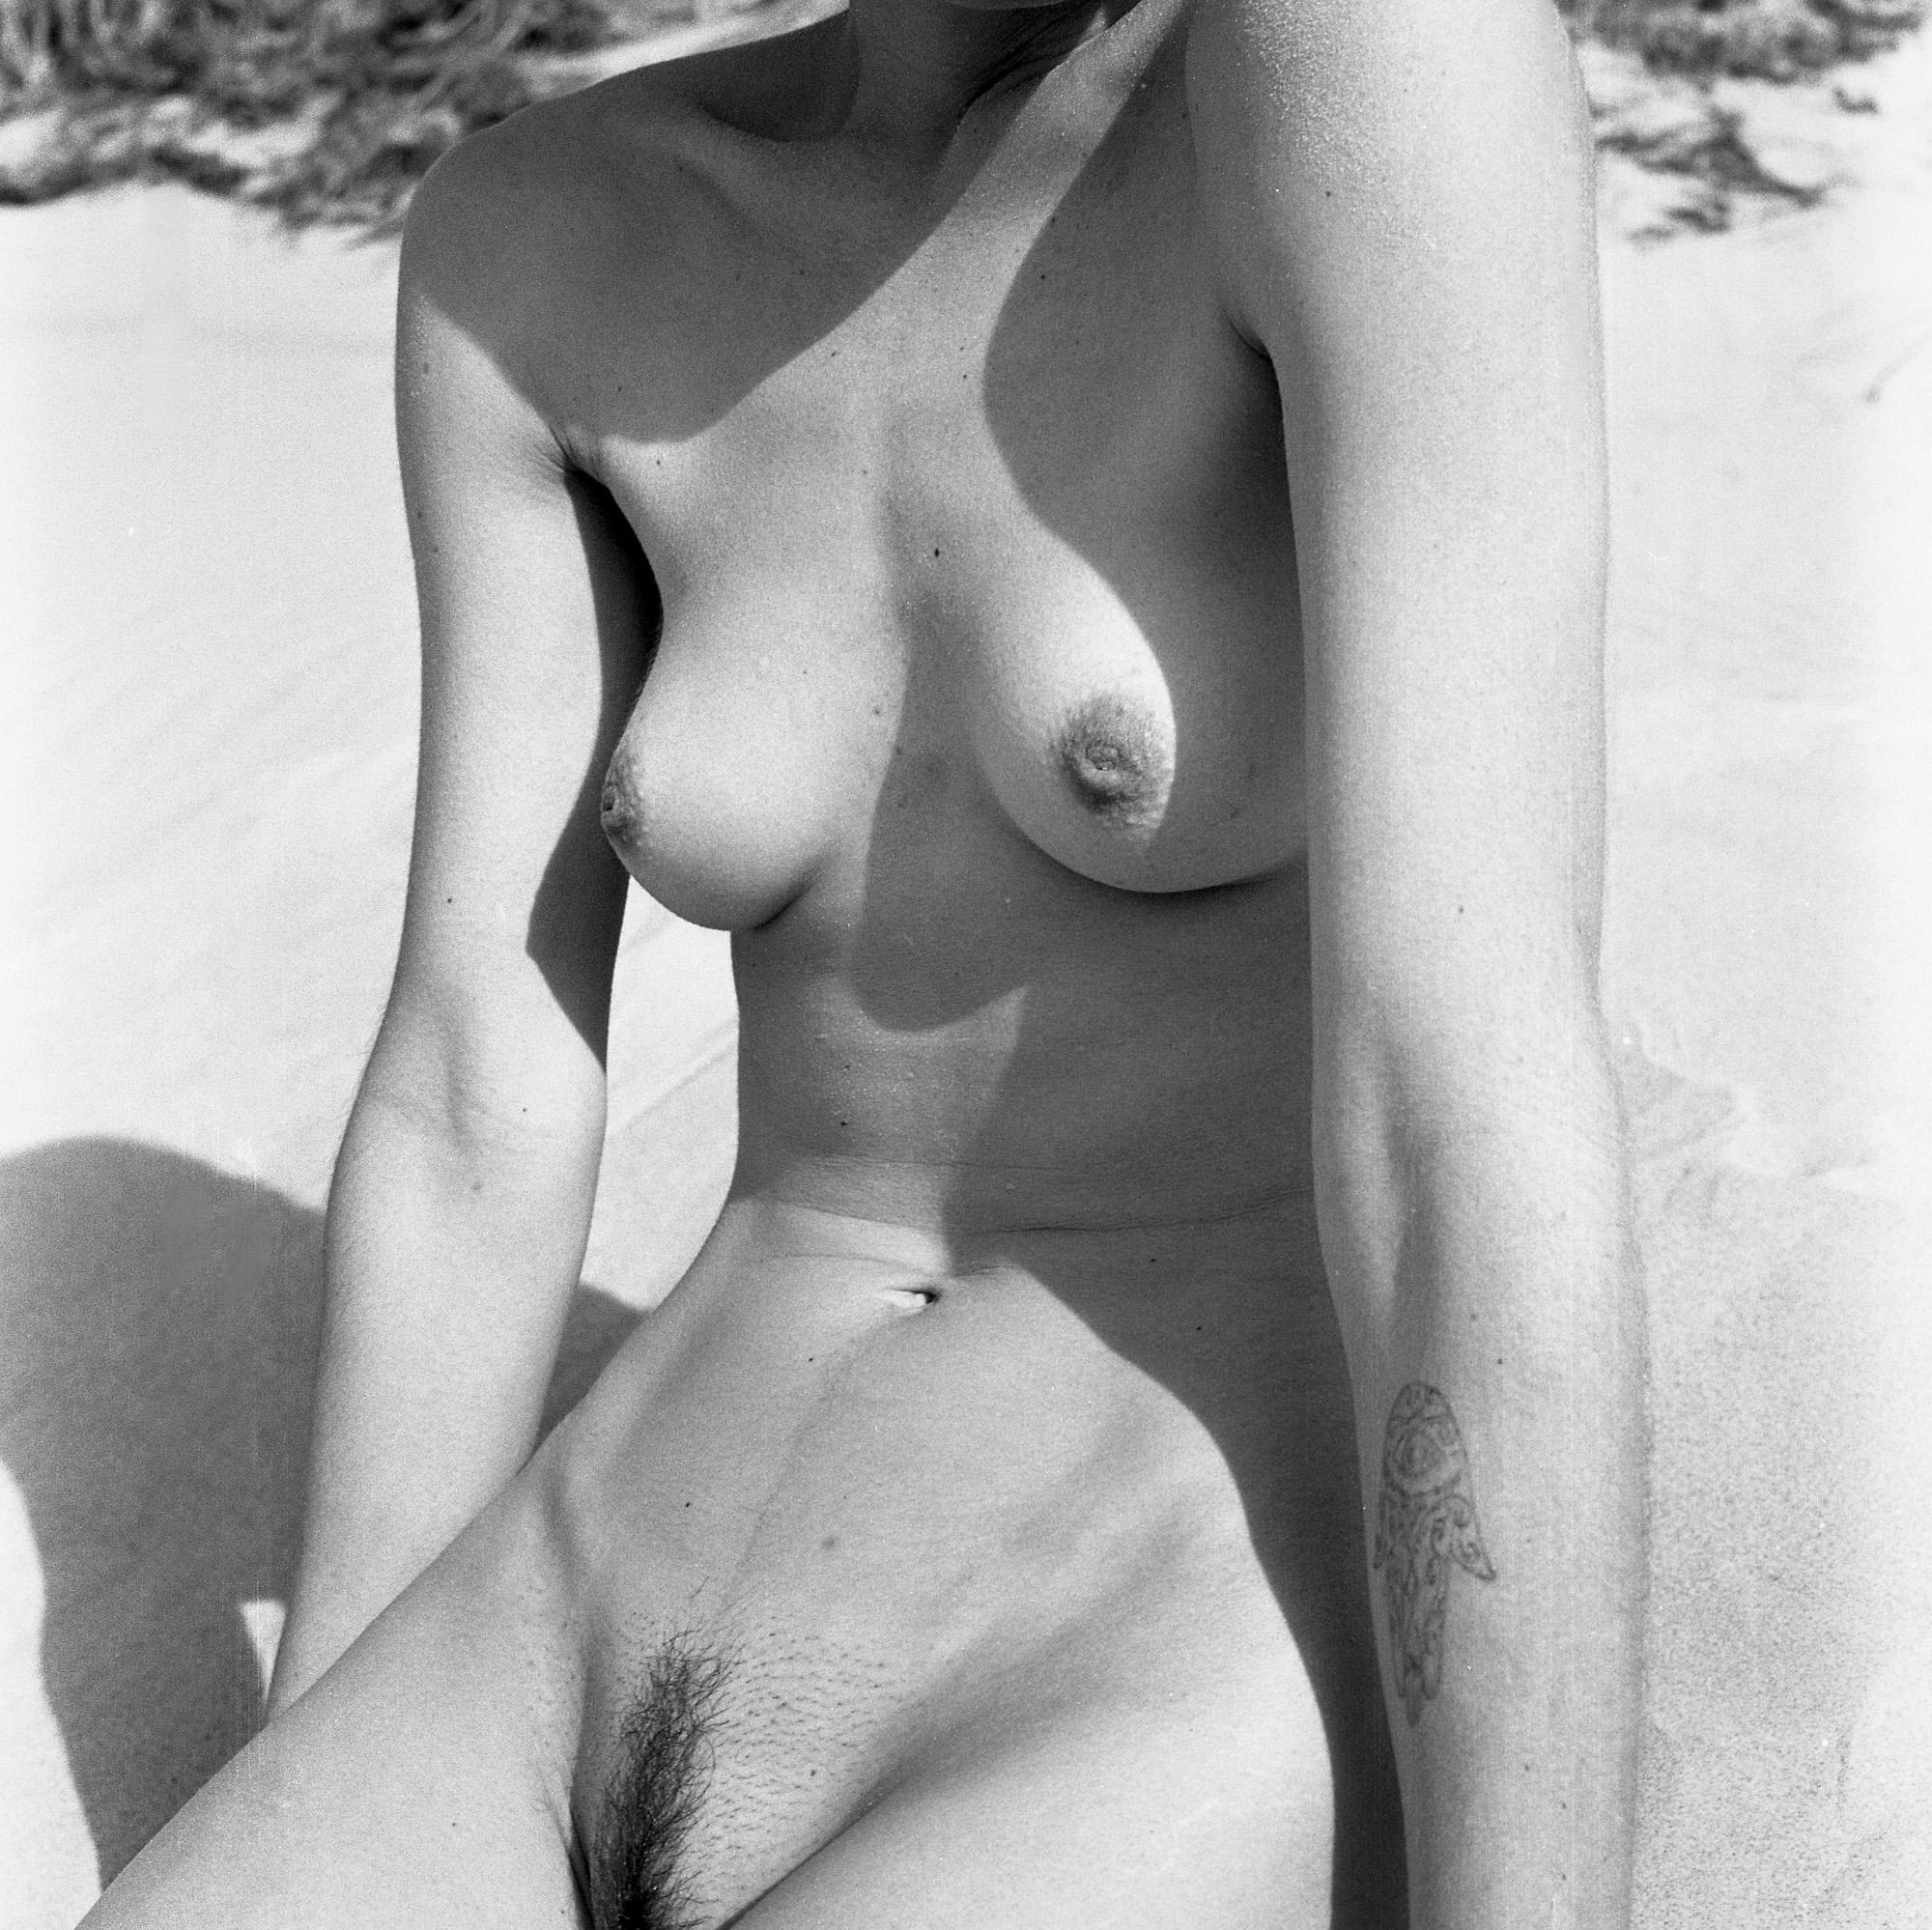 Henrikson Archive Nudes web_40.jpg